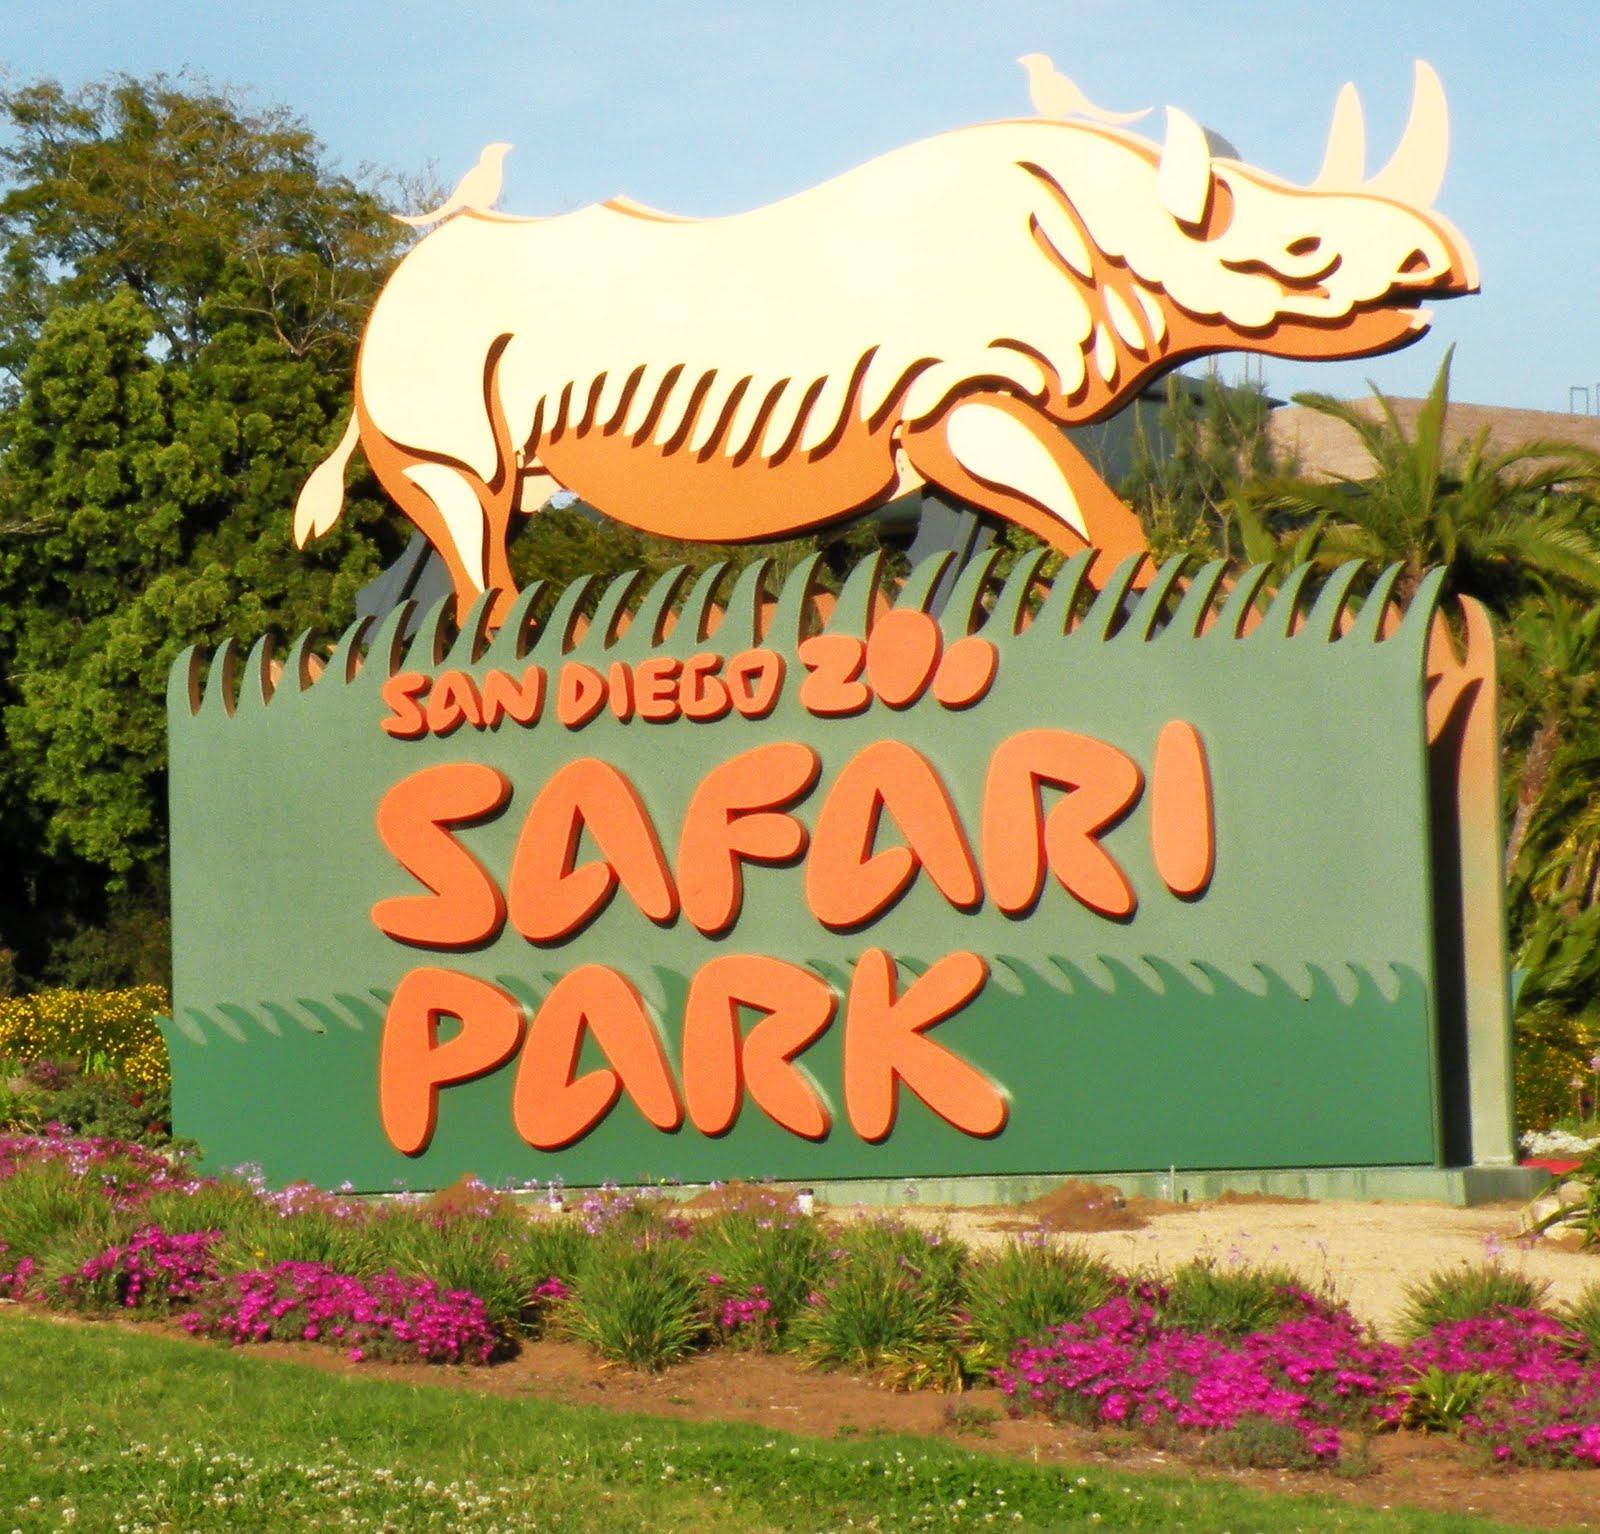 San Diego Zoo Safari Park TRAVEL GUIDE